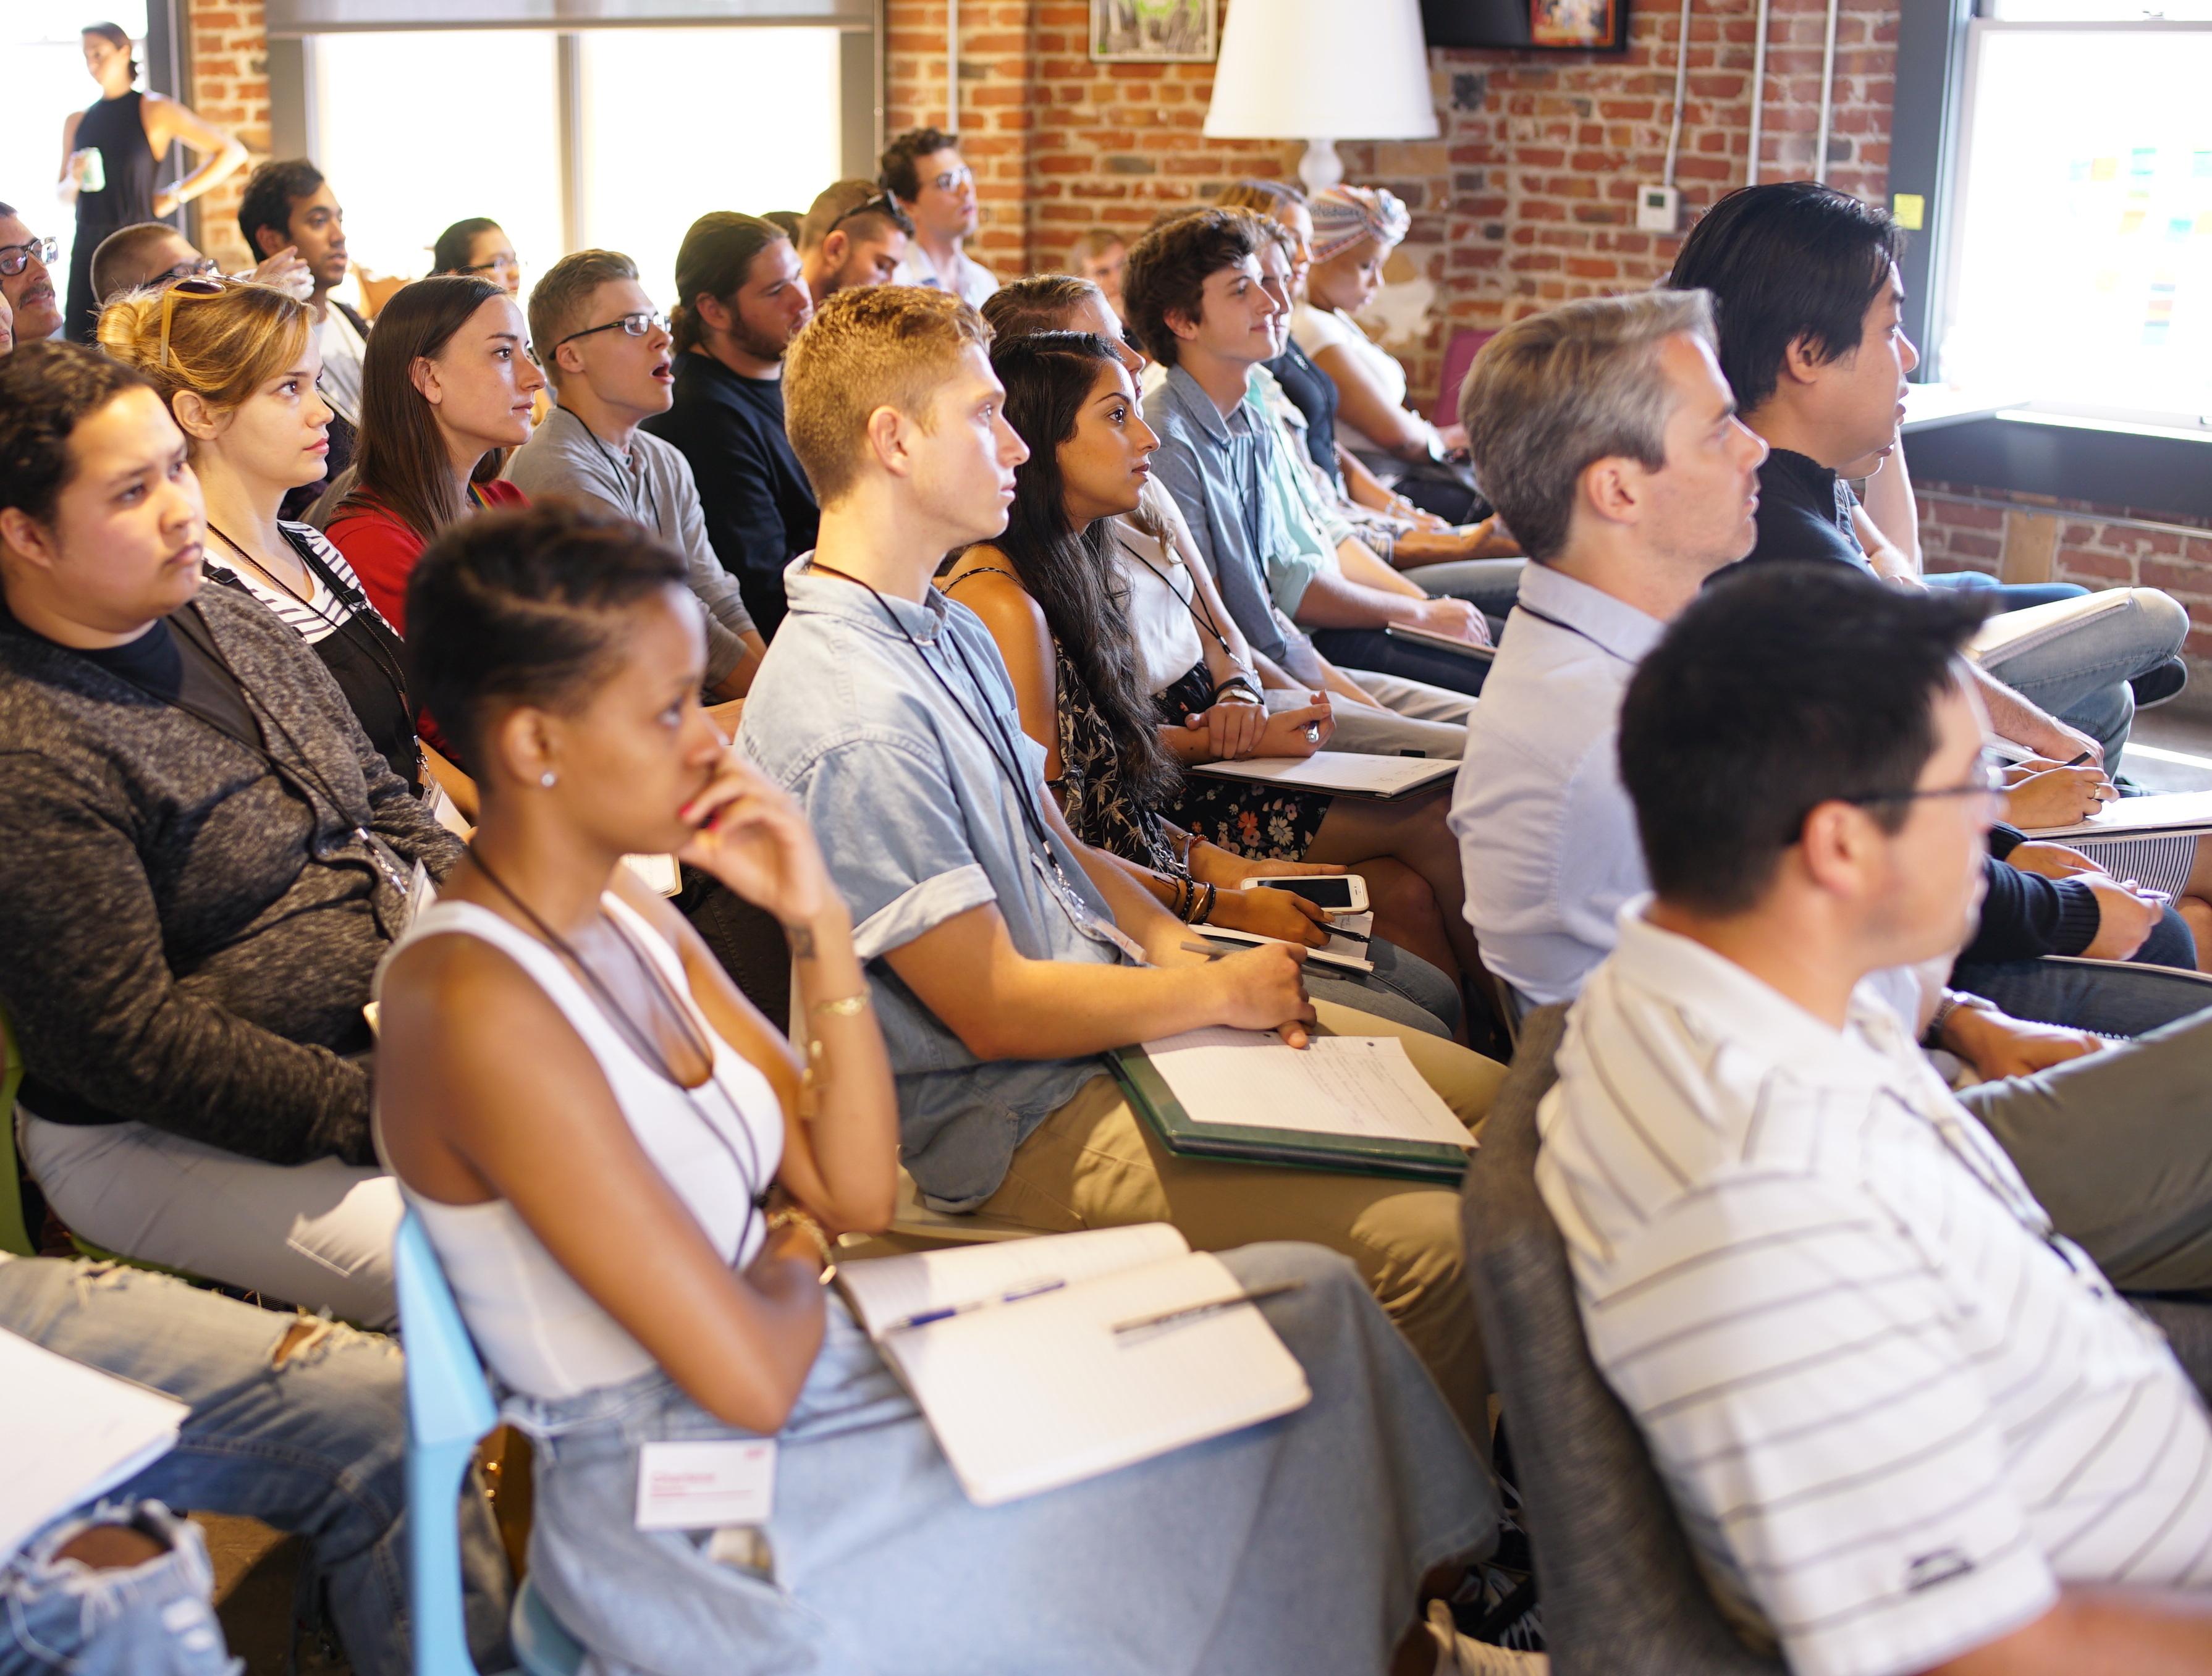 MissionU raises $8.5M to build an alternative one-year education program